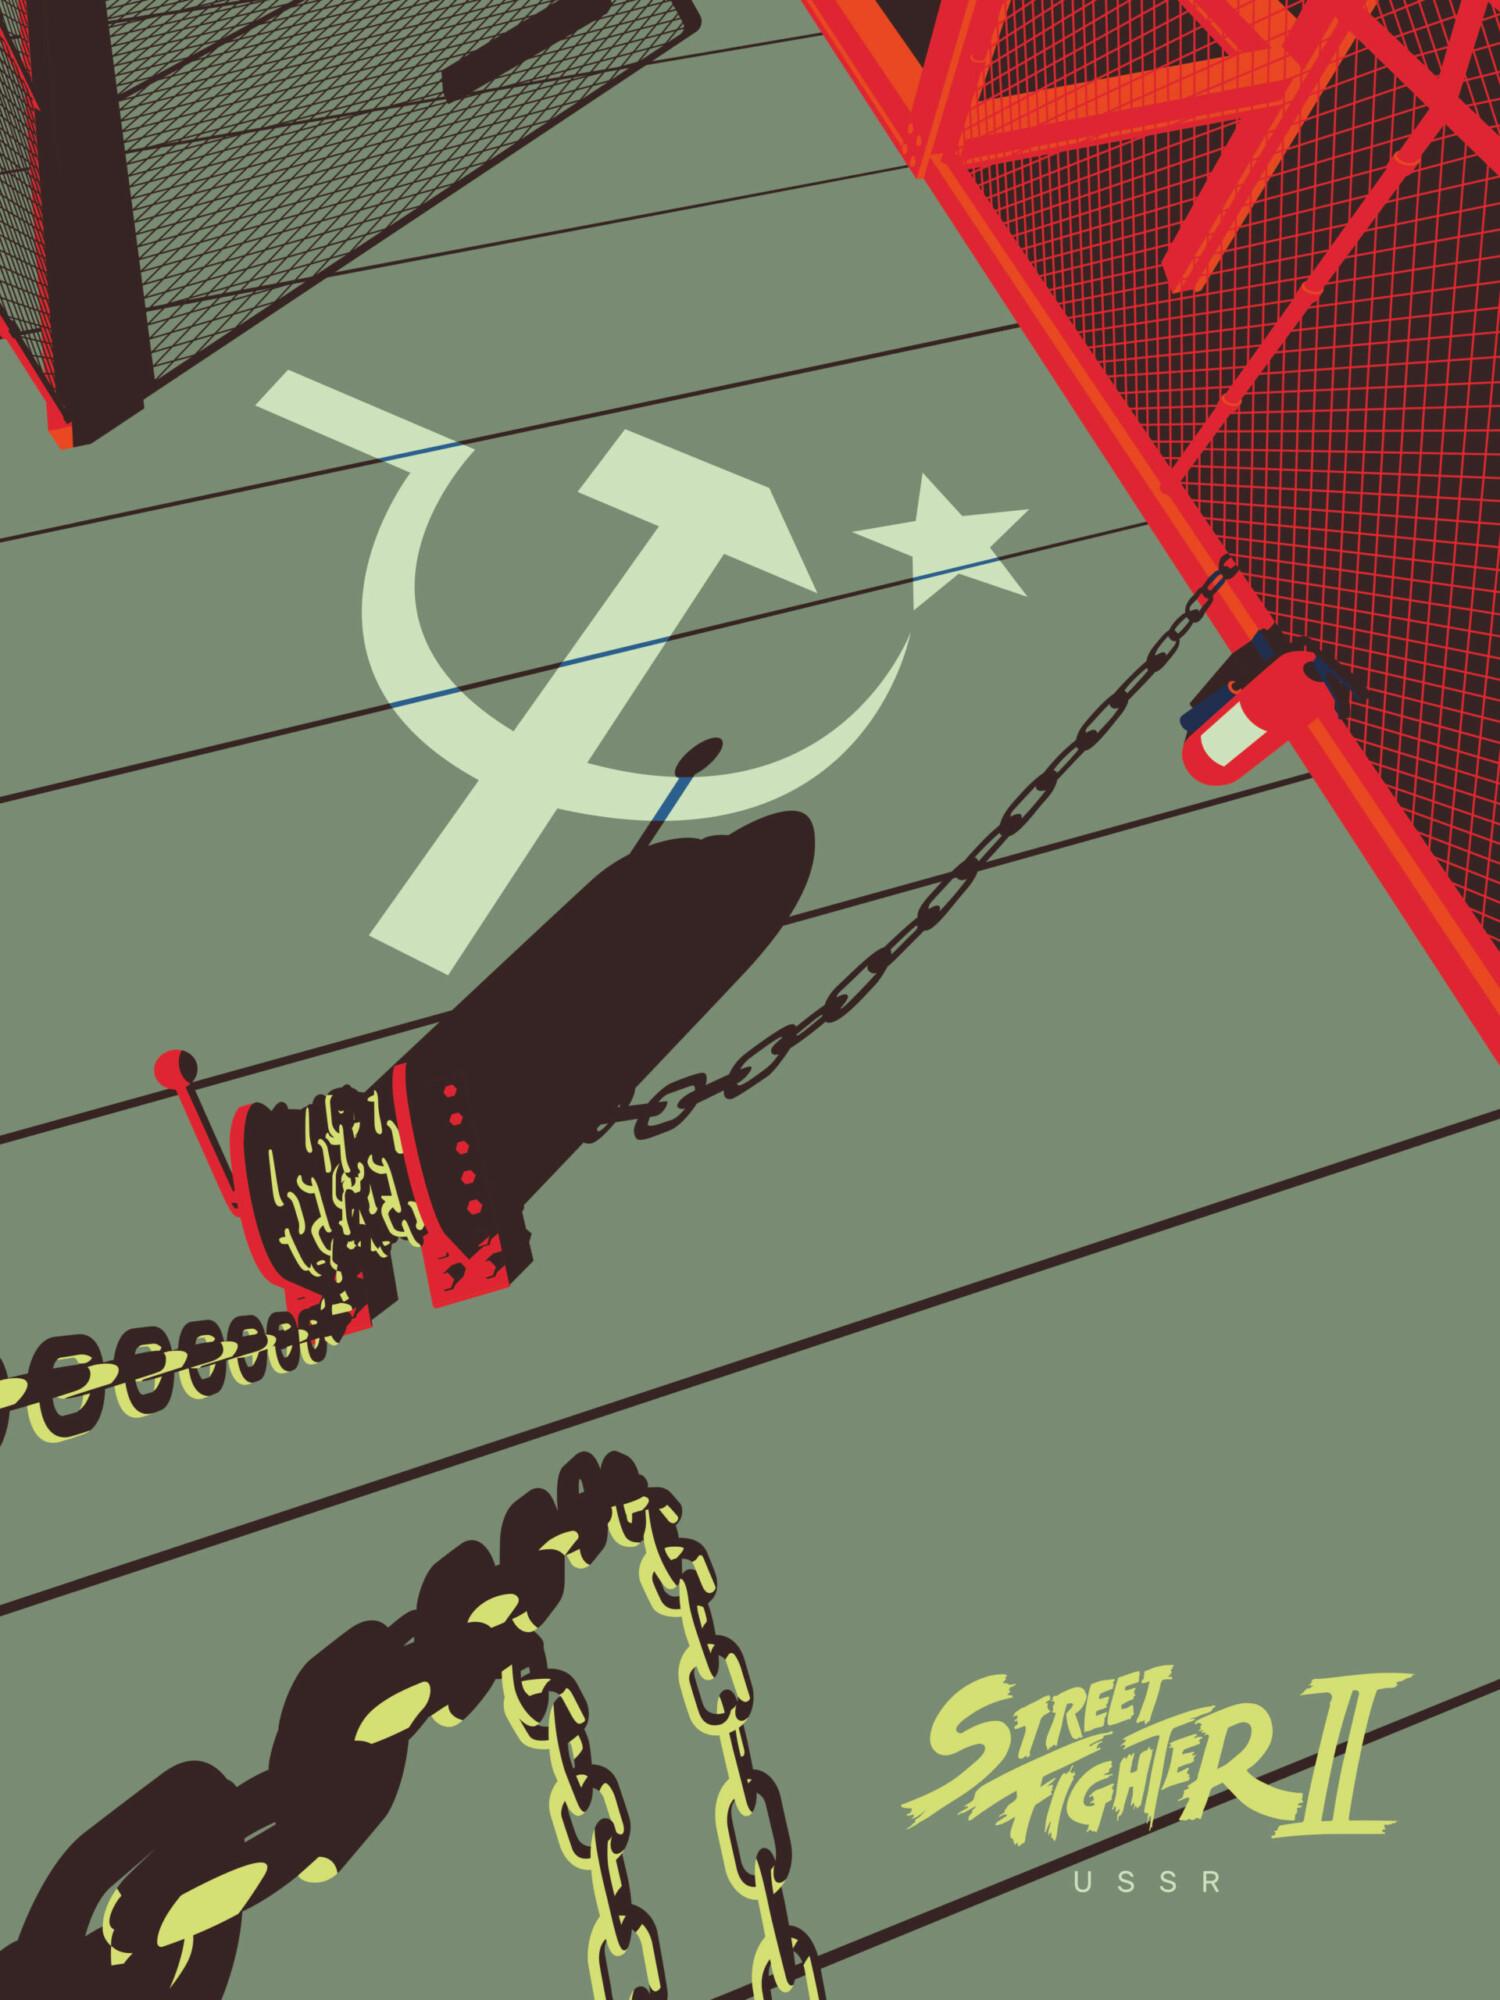 Streetfighter 2 - USSR/Zangief - PosterSpy